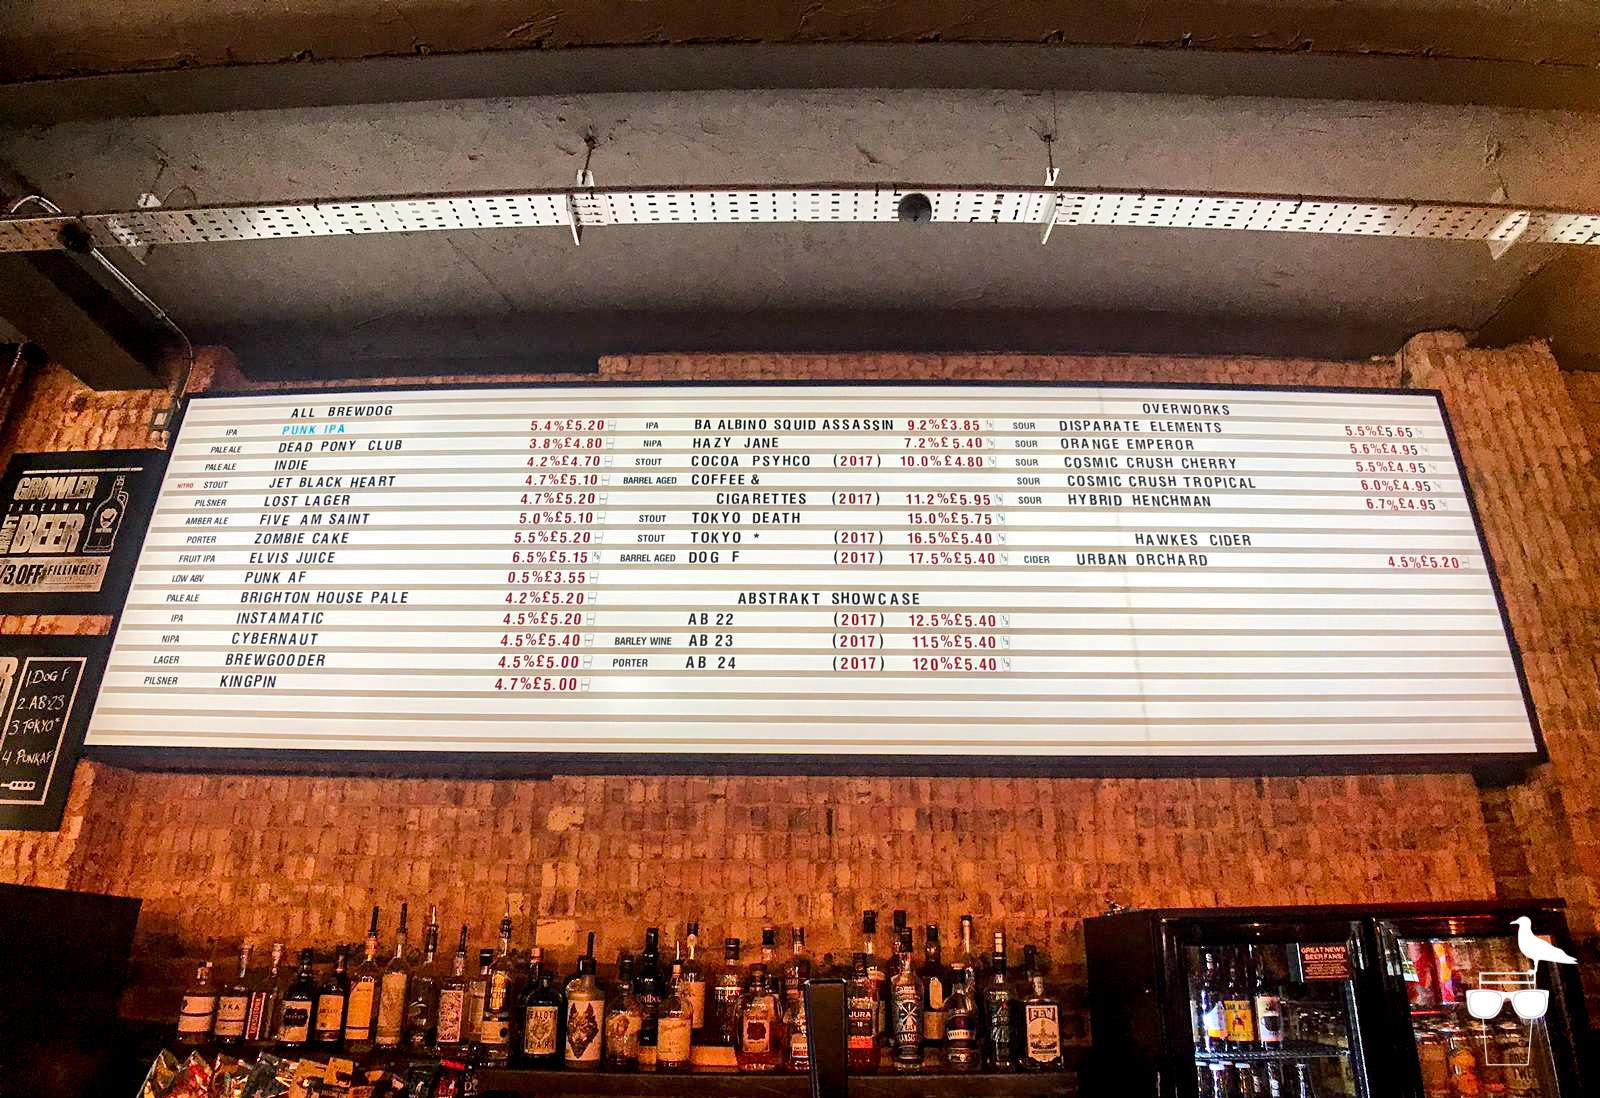 brewdog brighton beer options board